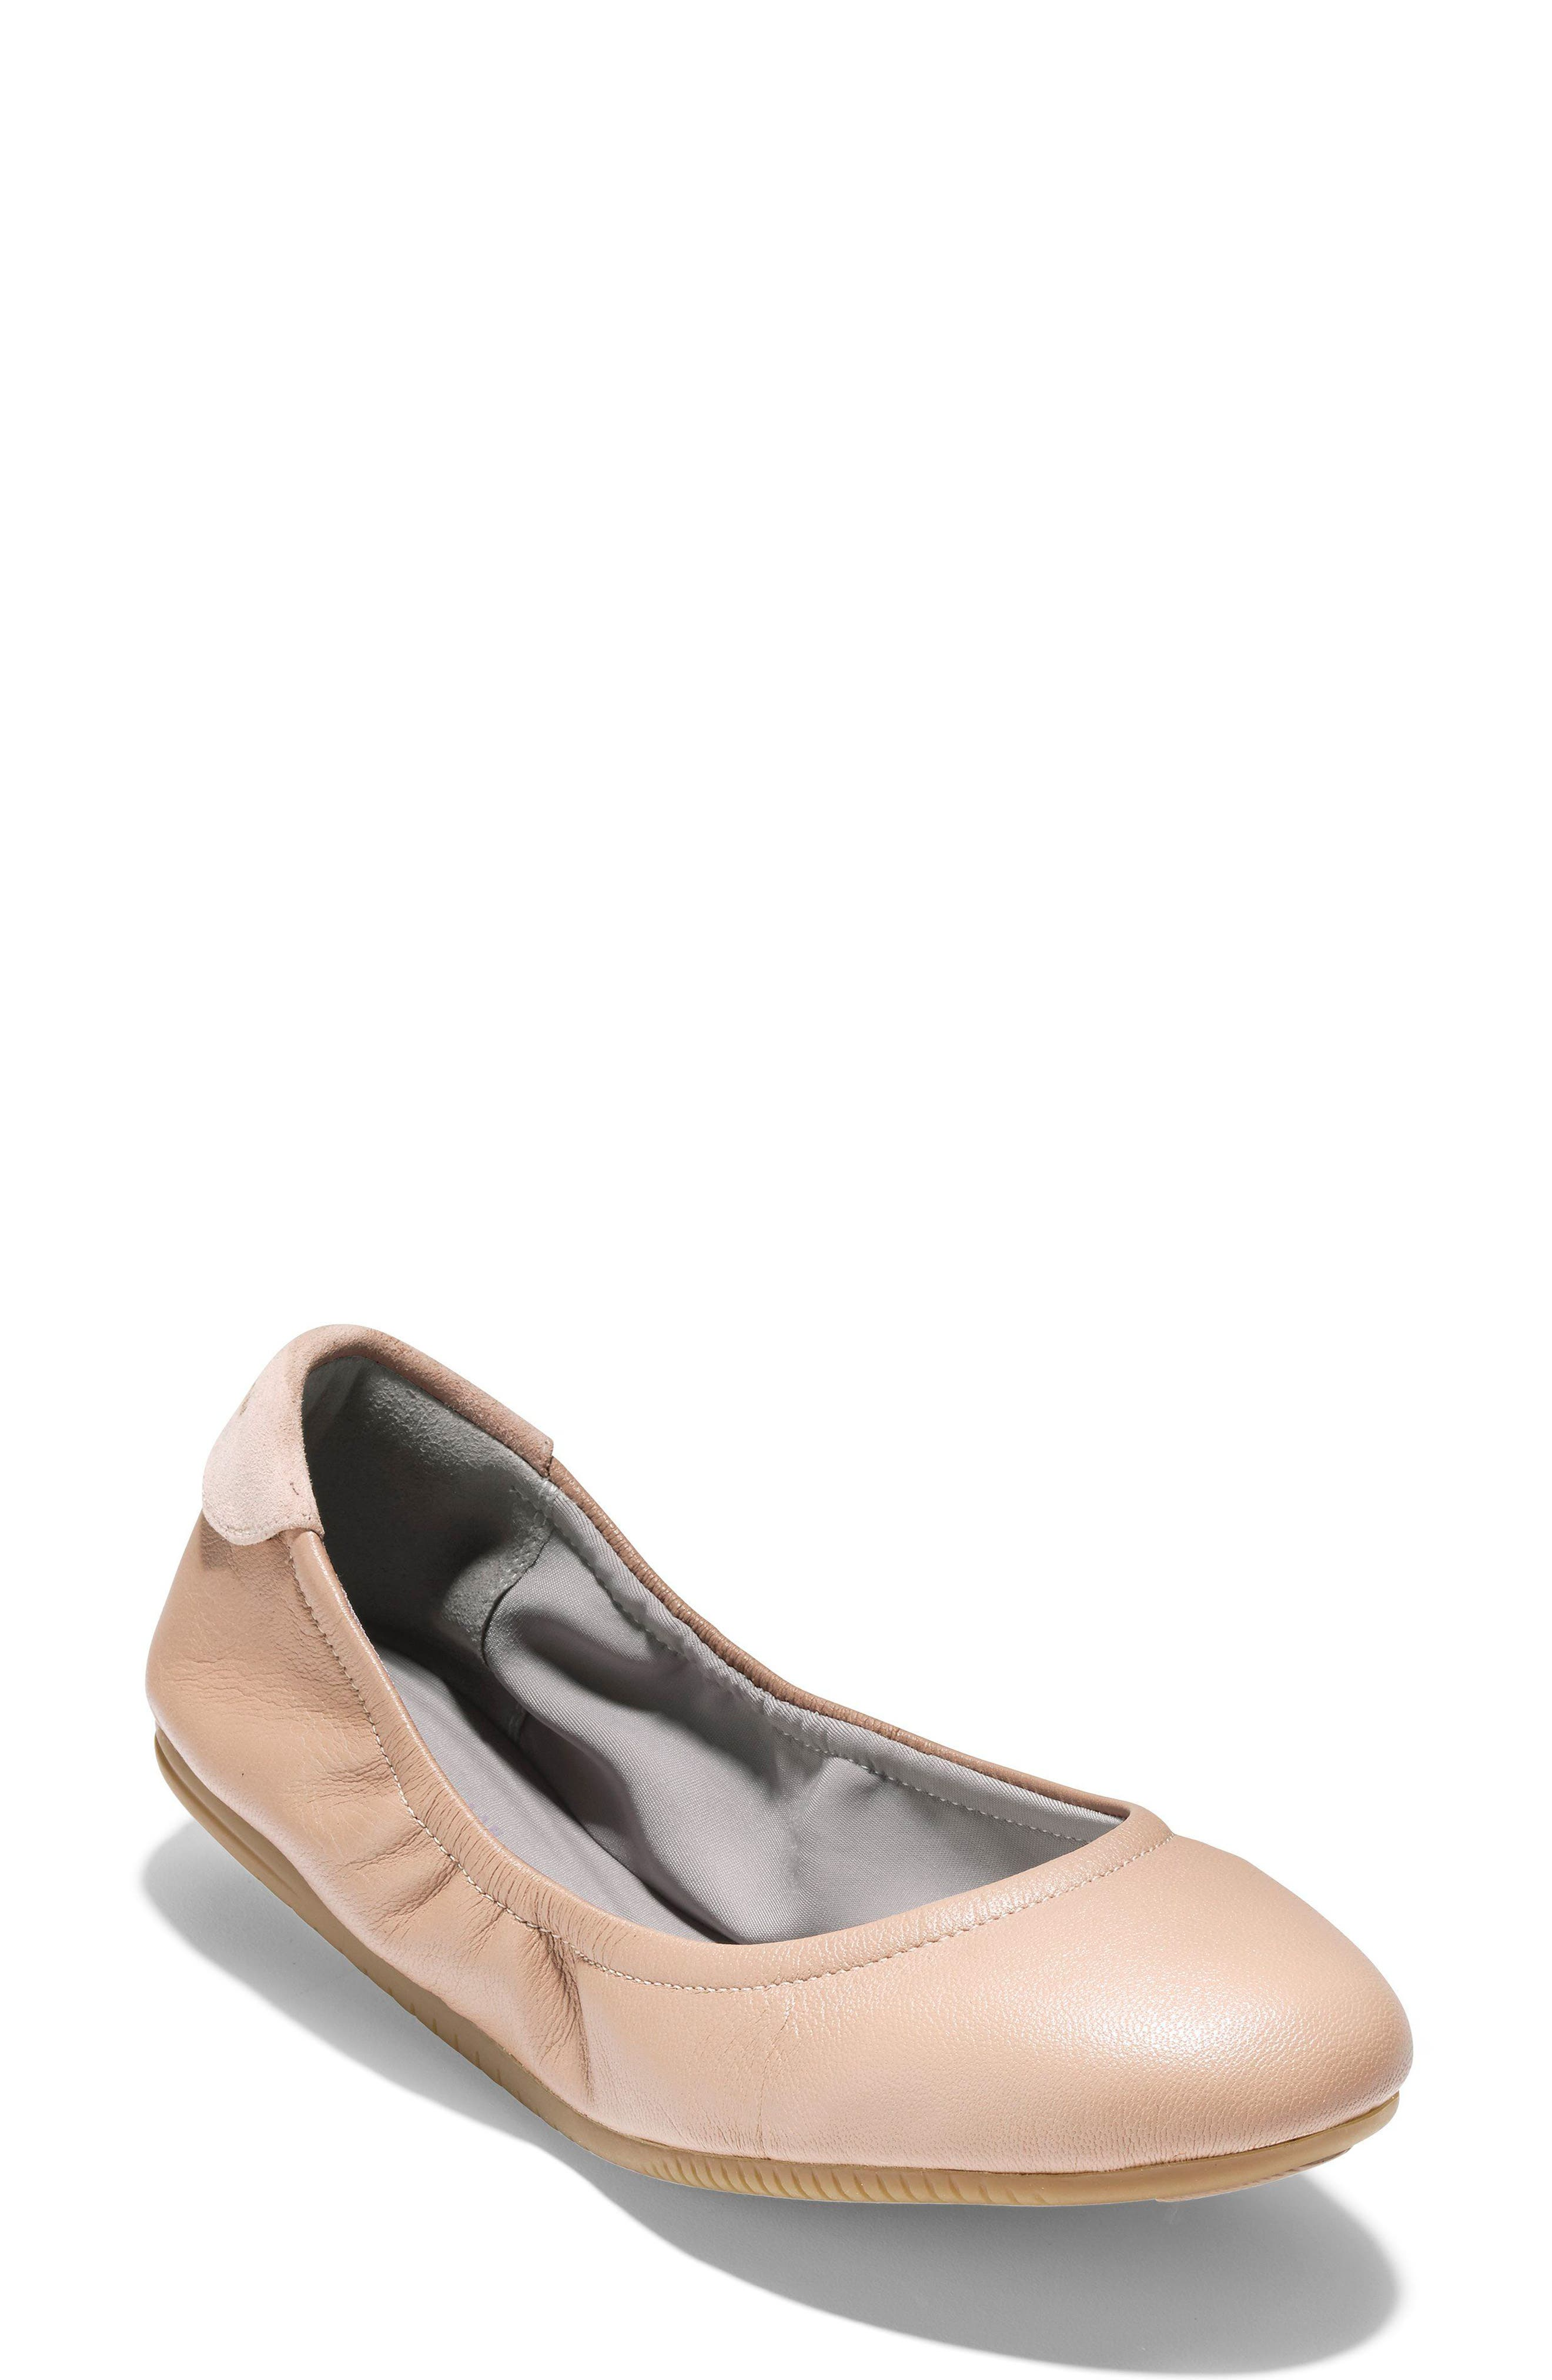 Studiogrand Ballet Flat,                         Main,                         color, MAPLE SUGAR LEATHER